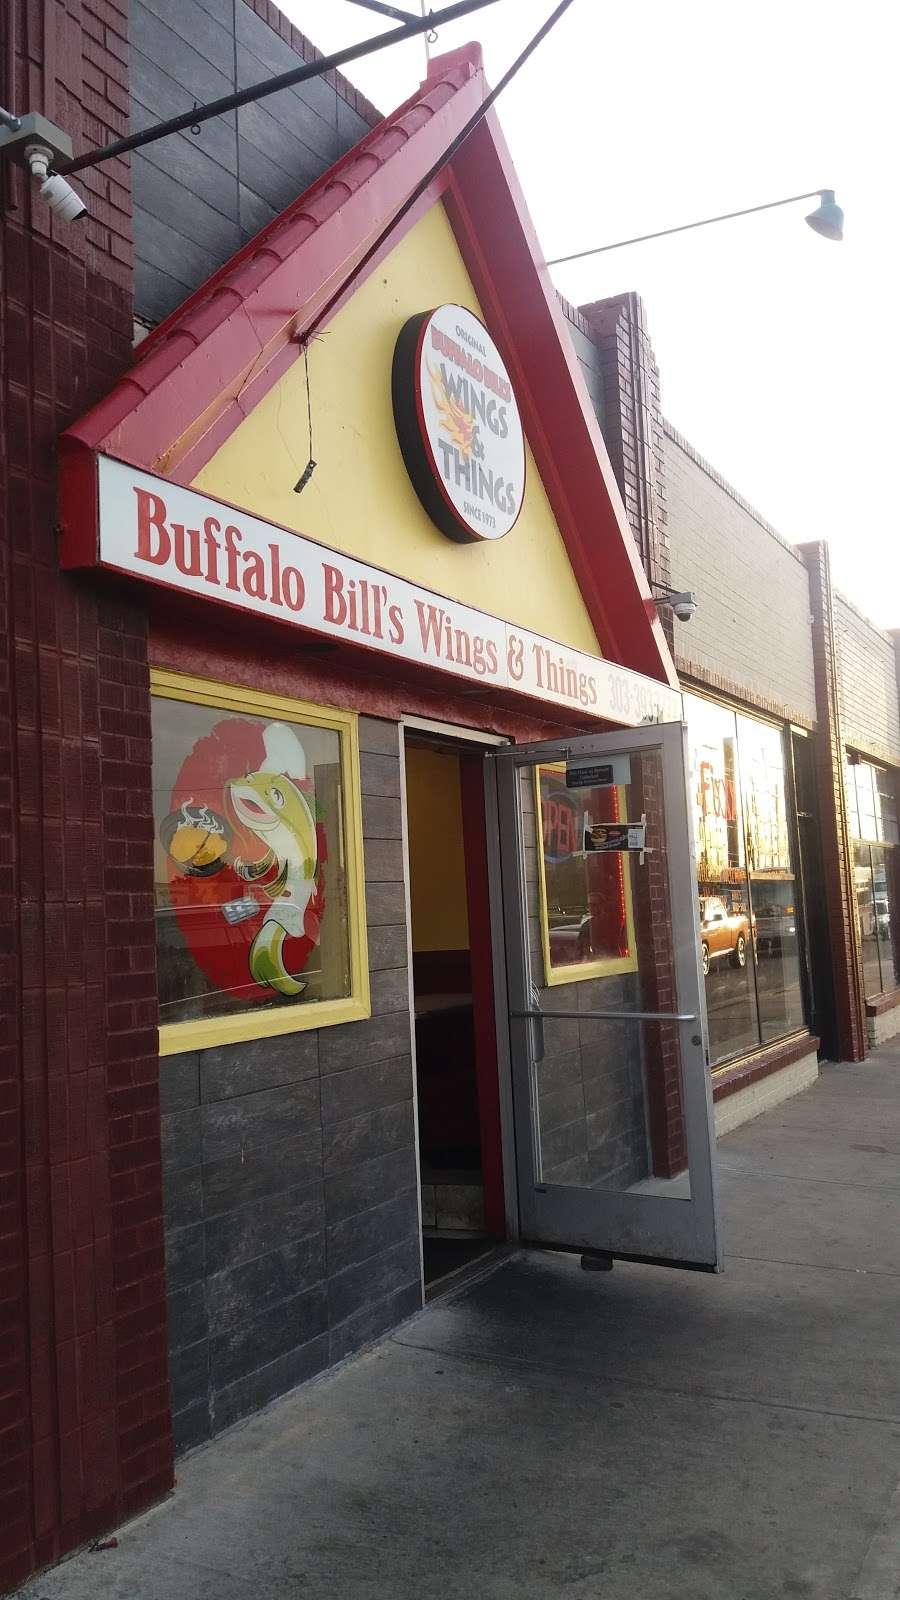 Buffalo Bills Wings & Things - restaurant    Photo 3 of 10   Address: 7236 E Colfax Ave, Denver, CO 80220, USA   Phone: (303) 393-7777